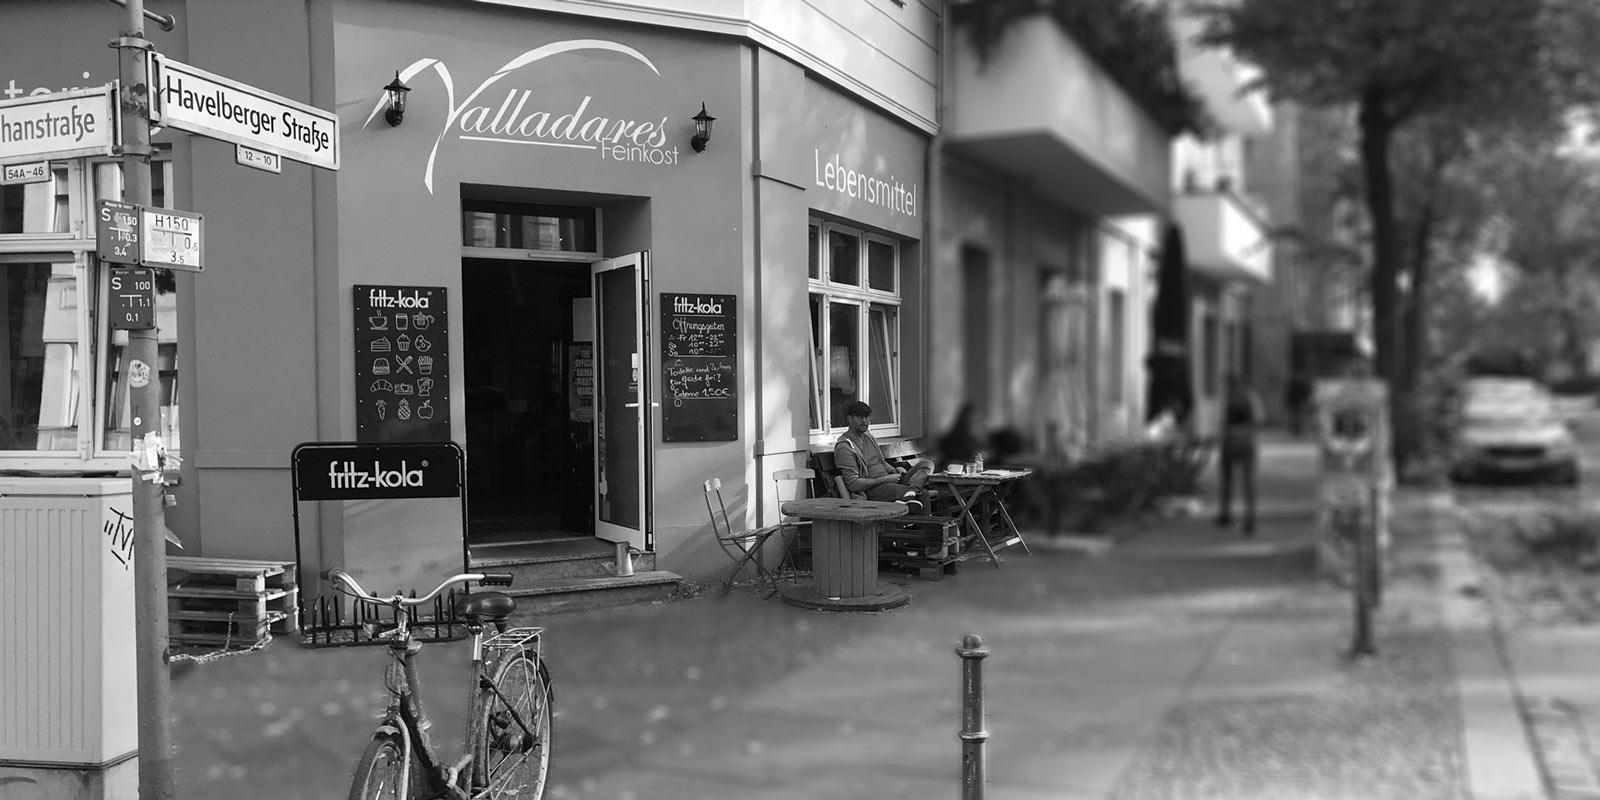 Review: Valladares (Berlin)